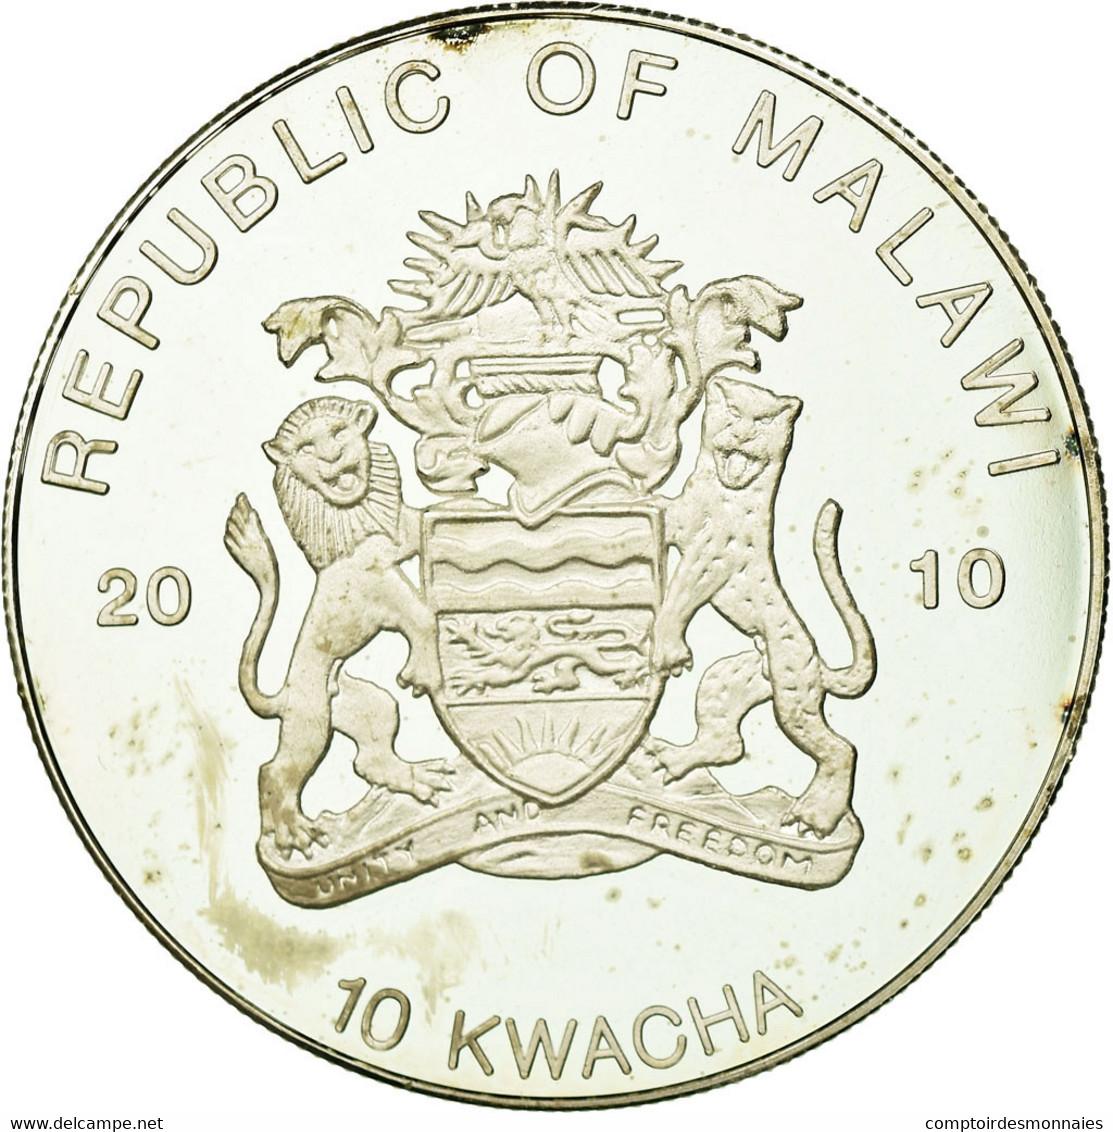 Monnaie, Malawi, 10 Kwacha, 2010, SUP+, Silver Plated Copper-nickel - Malawi